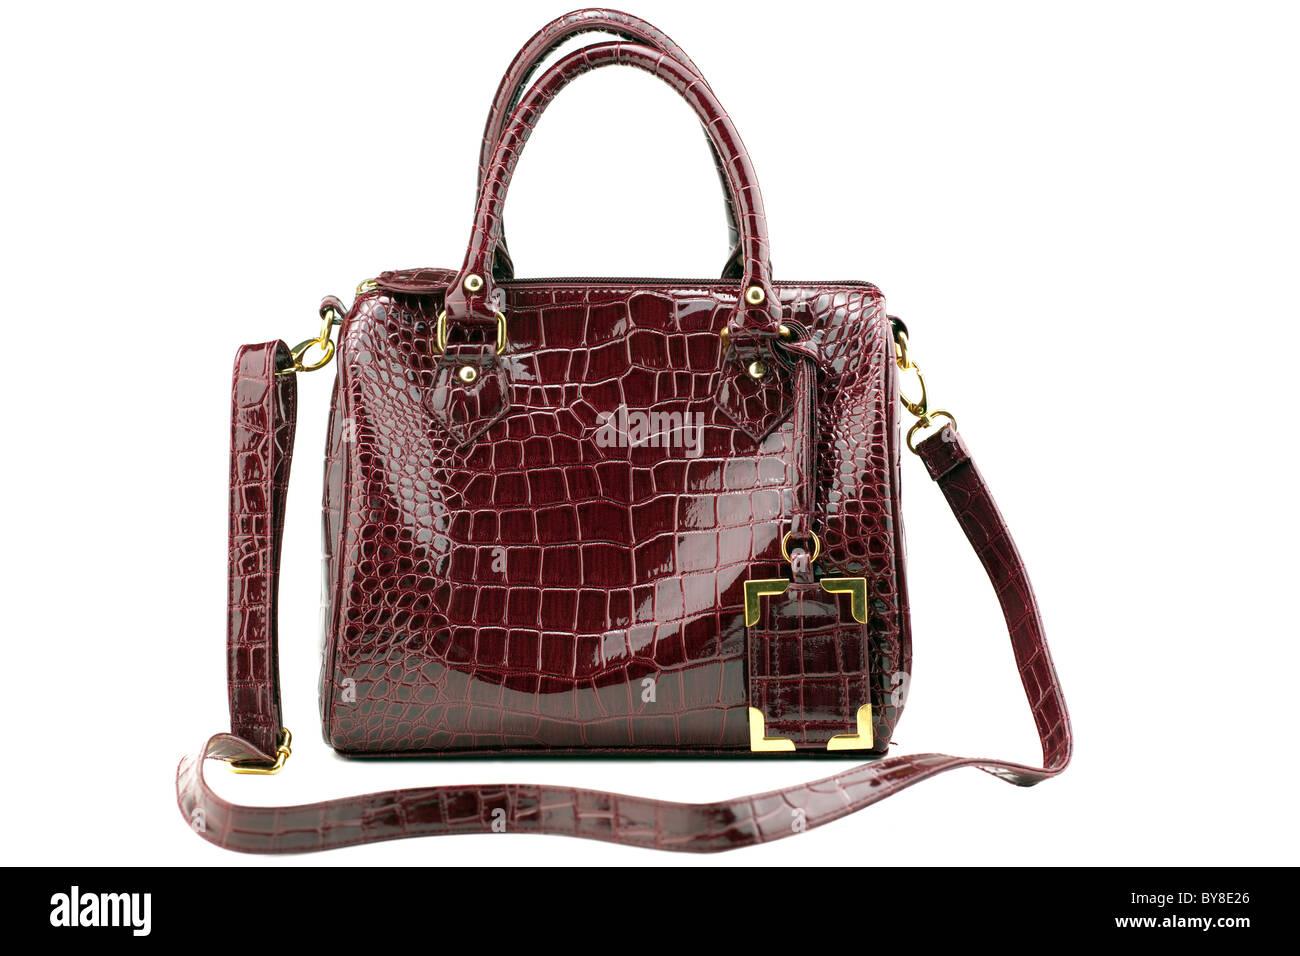 maroon imitation crocodile leather handbag - Stock Image